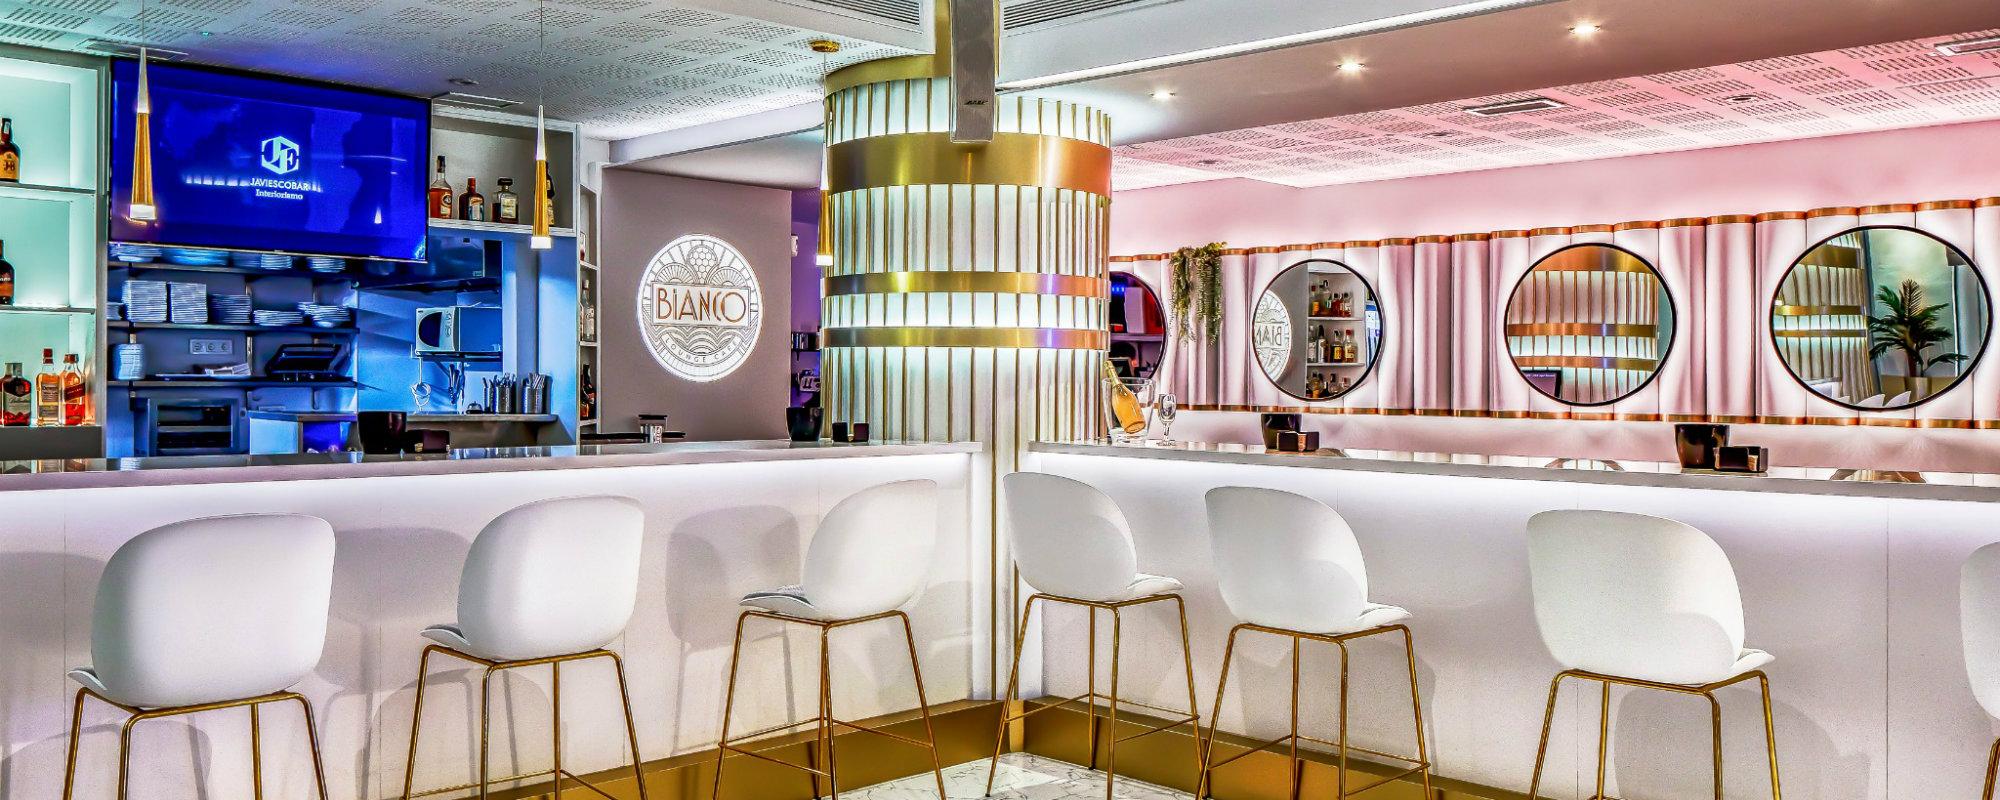 Interiorismo lujuoso: Javier Escobar un diseñador de interiores perfecto interiorismo lujuoso Interiorismo lujuoso: Javi Escobar un diseñador de interiores perfecto Featured 6